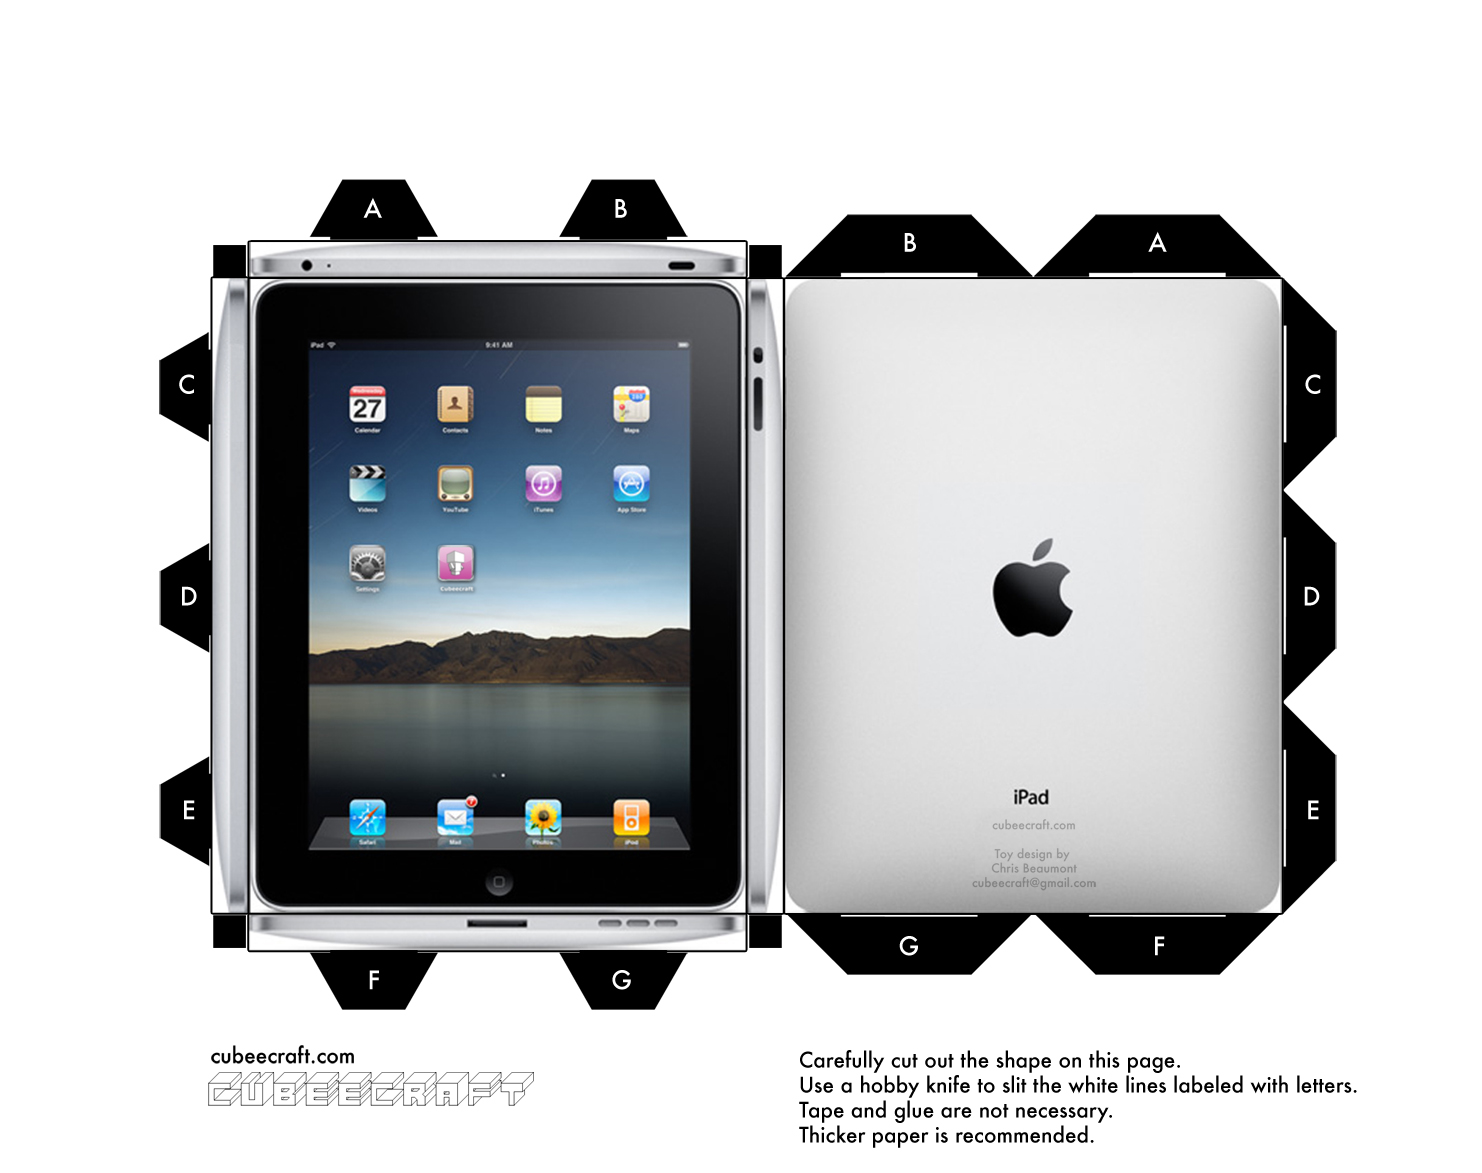 Cubeecraft iPad by cubeecraft on DeviantArt